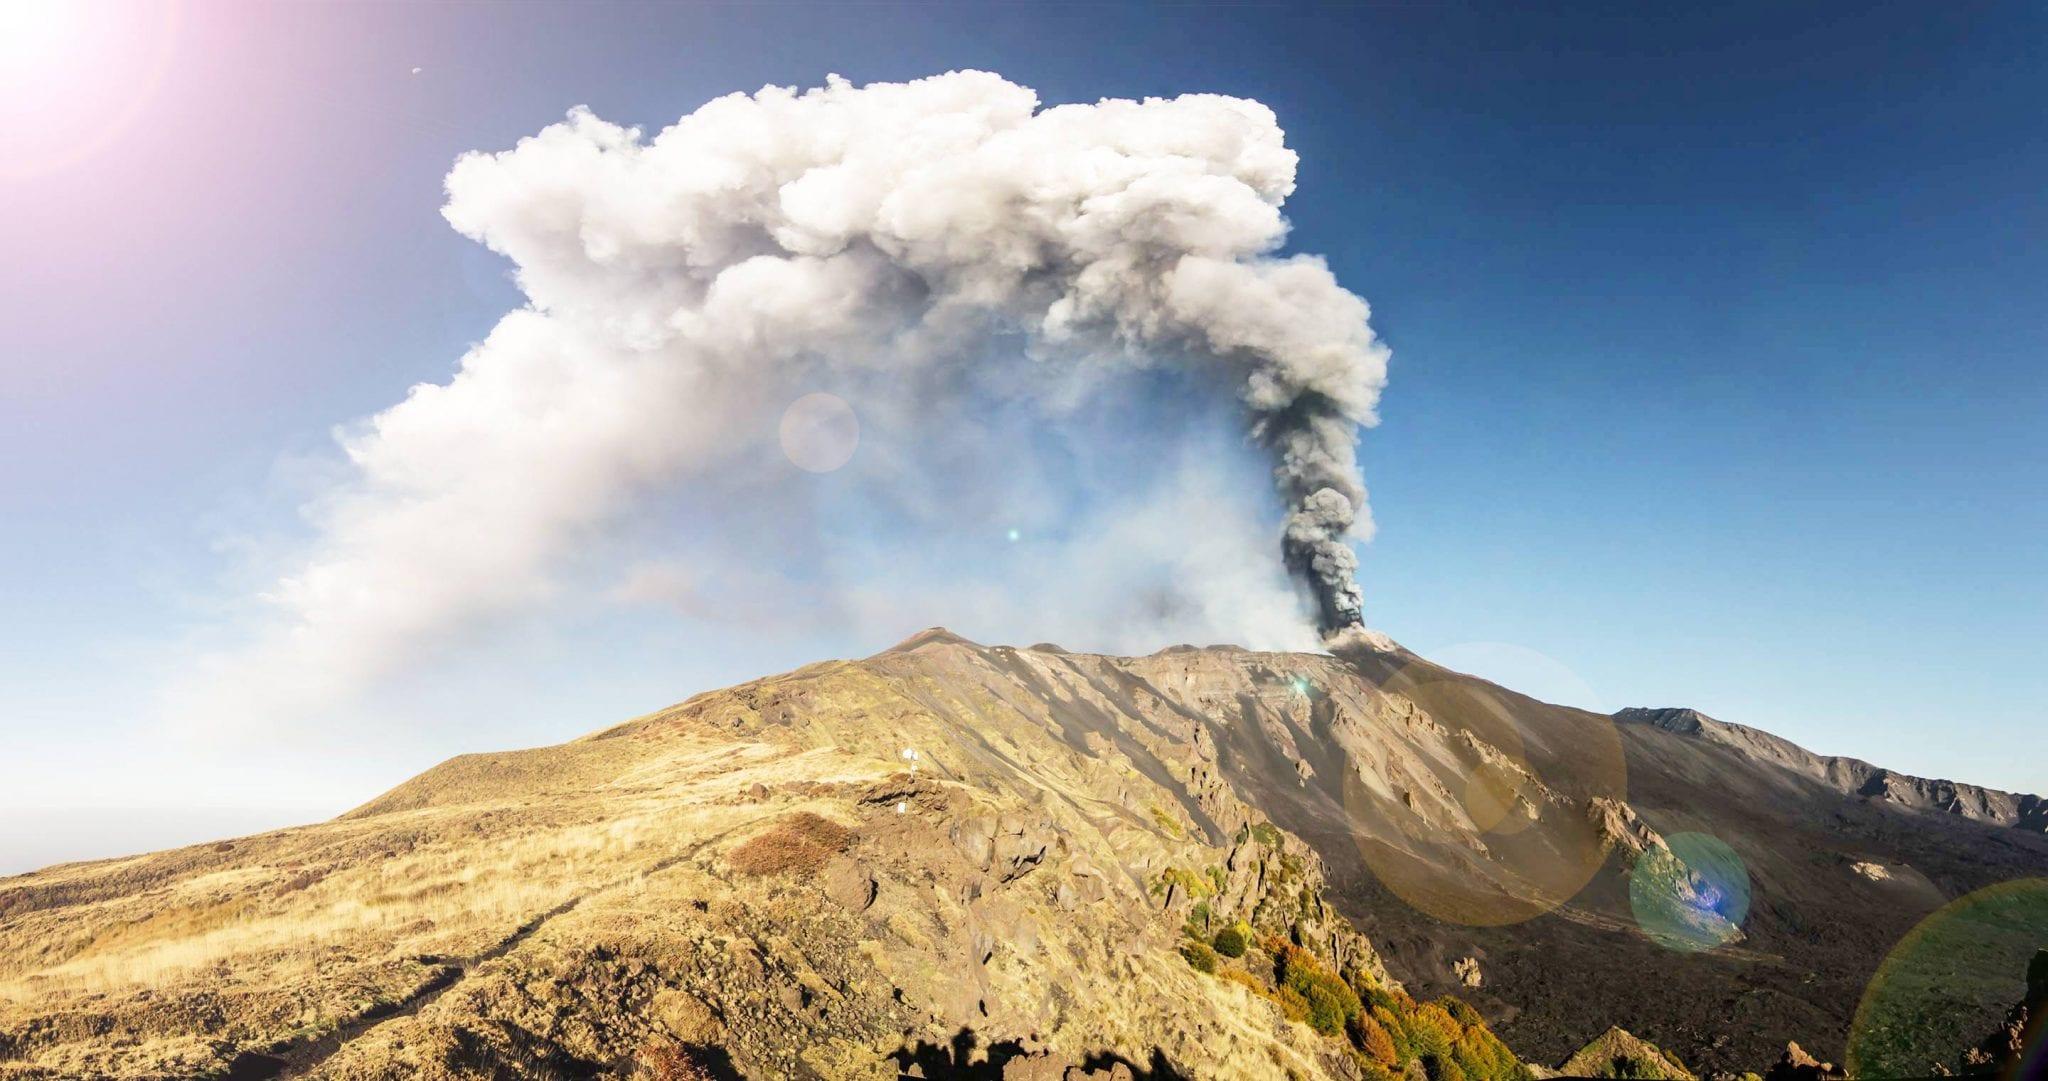 Sizilien – Vulkane, antike Kultur und Lebensart